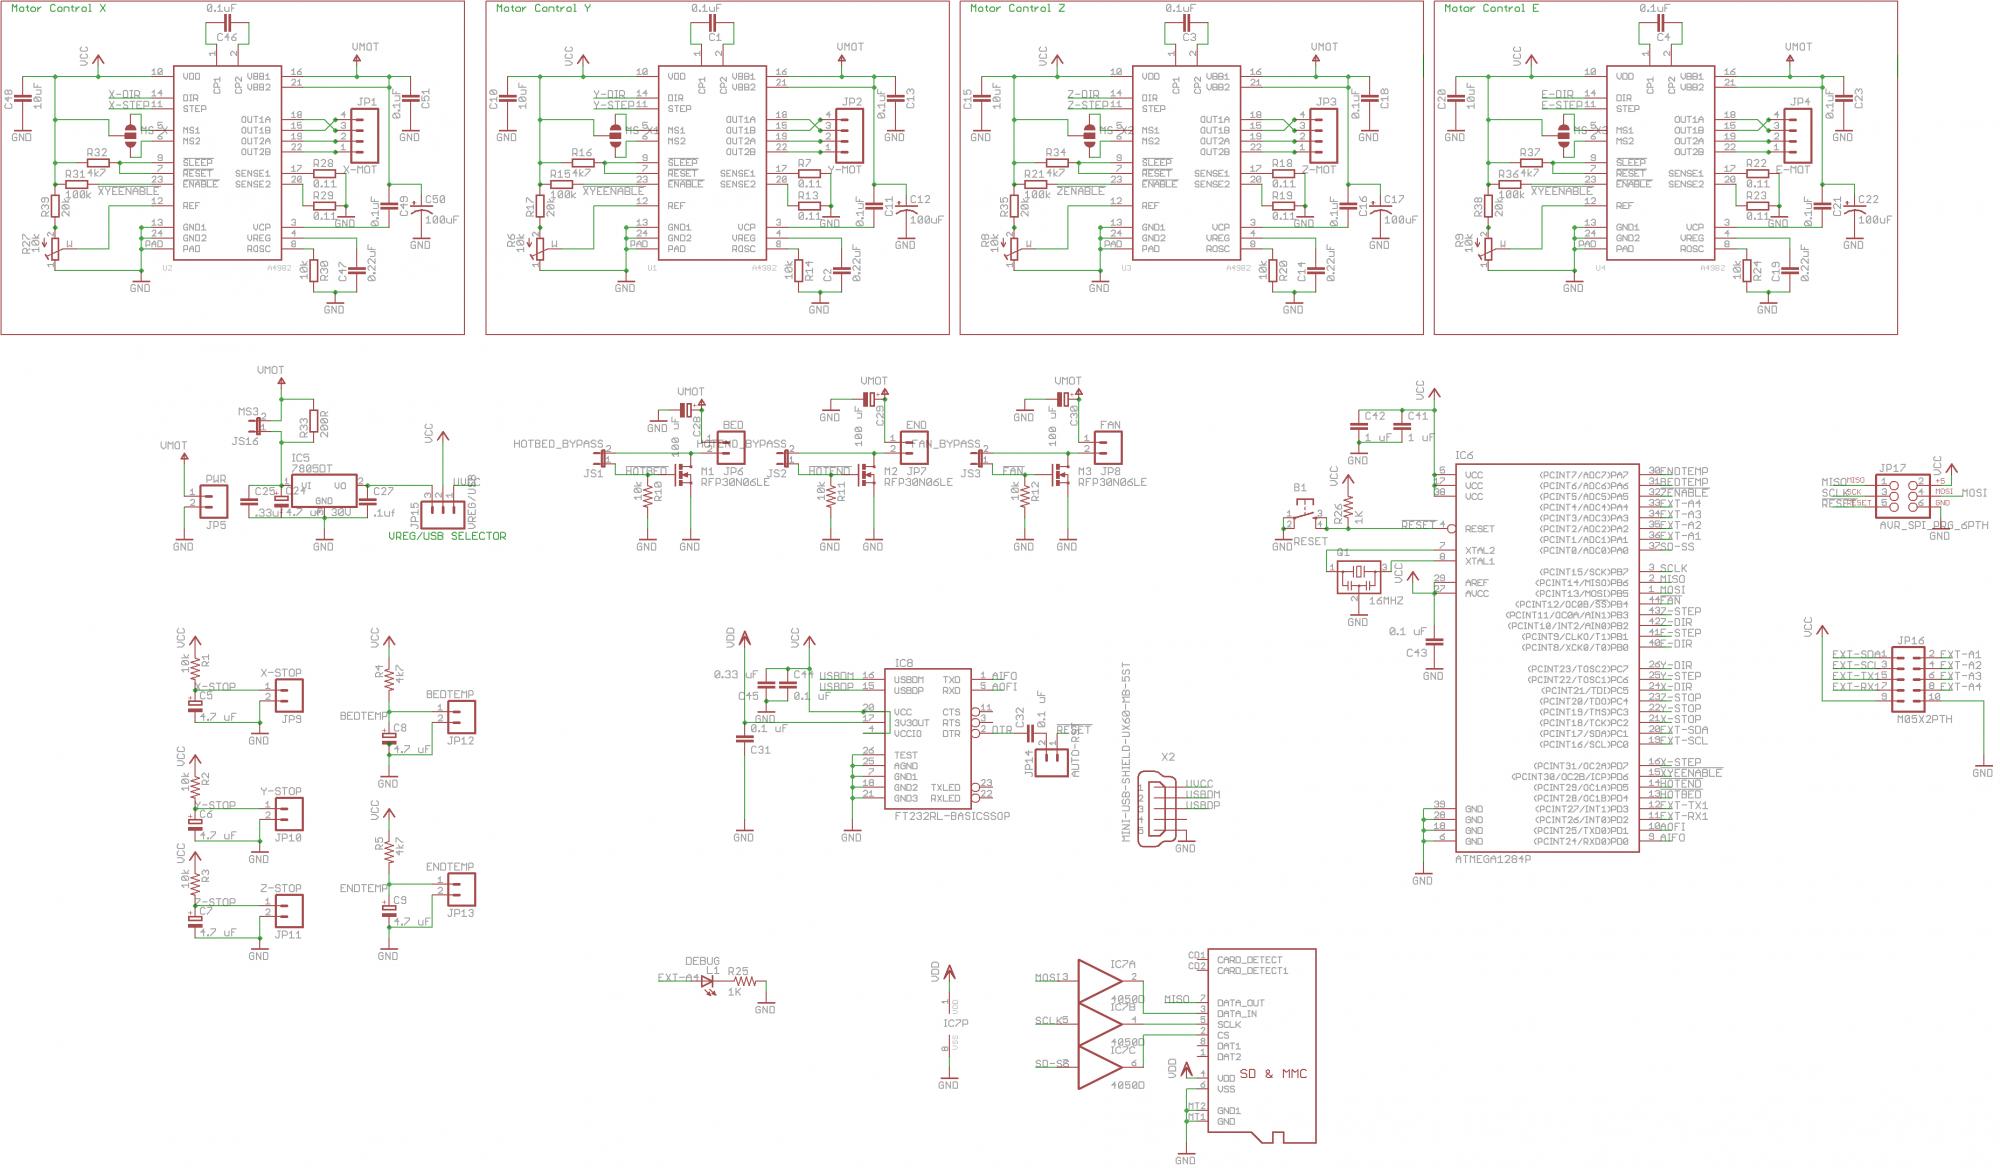 Ktm 525 Wiring Diagram Wiring Diagram - Wiring Diagram